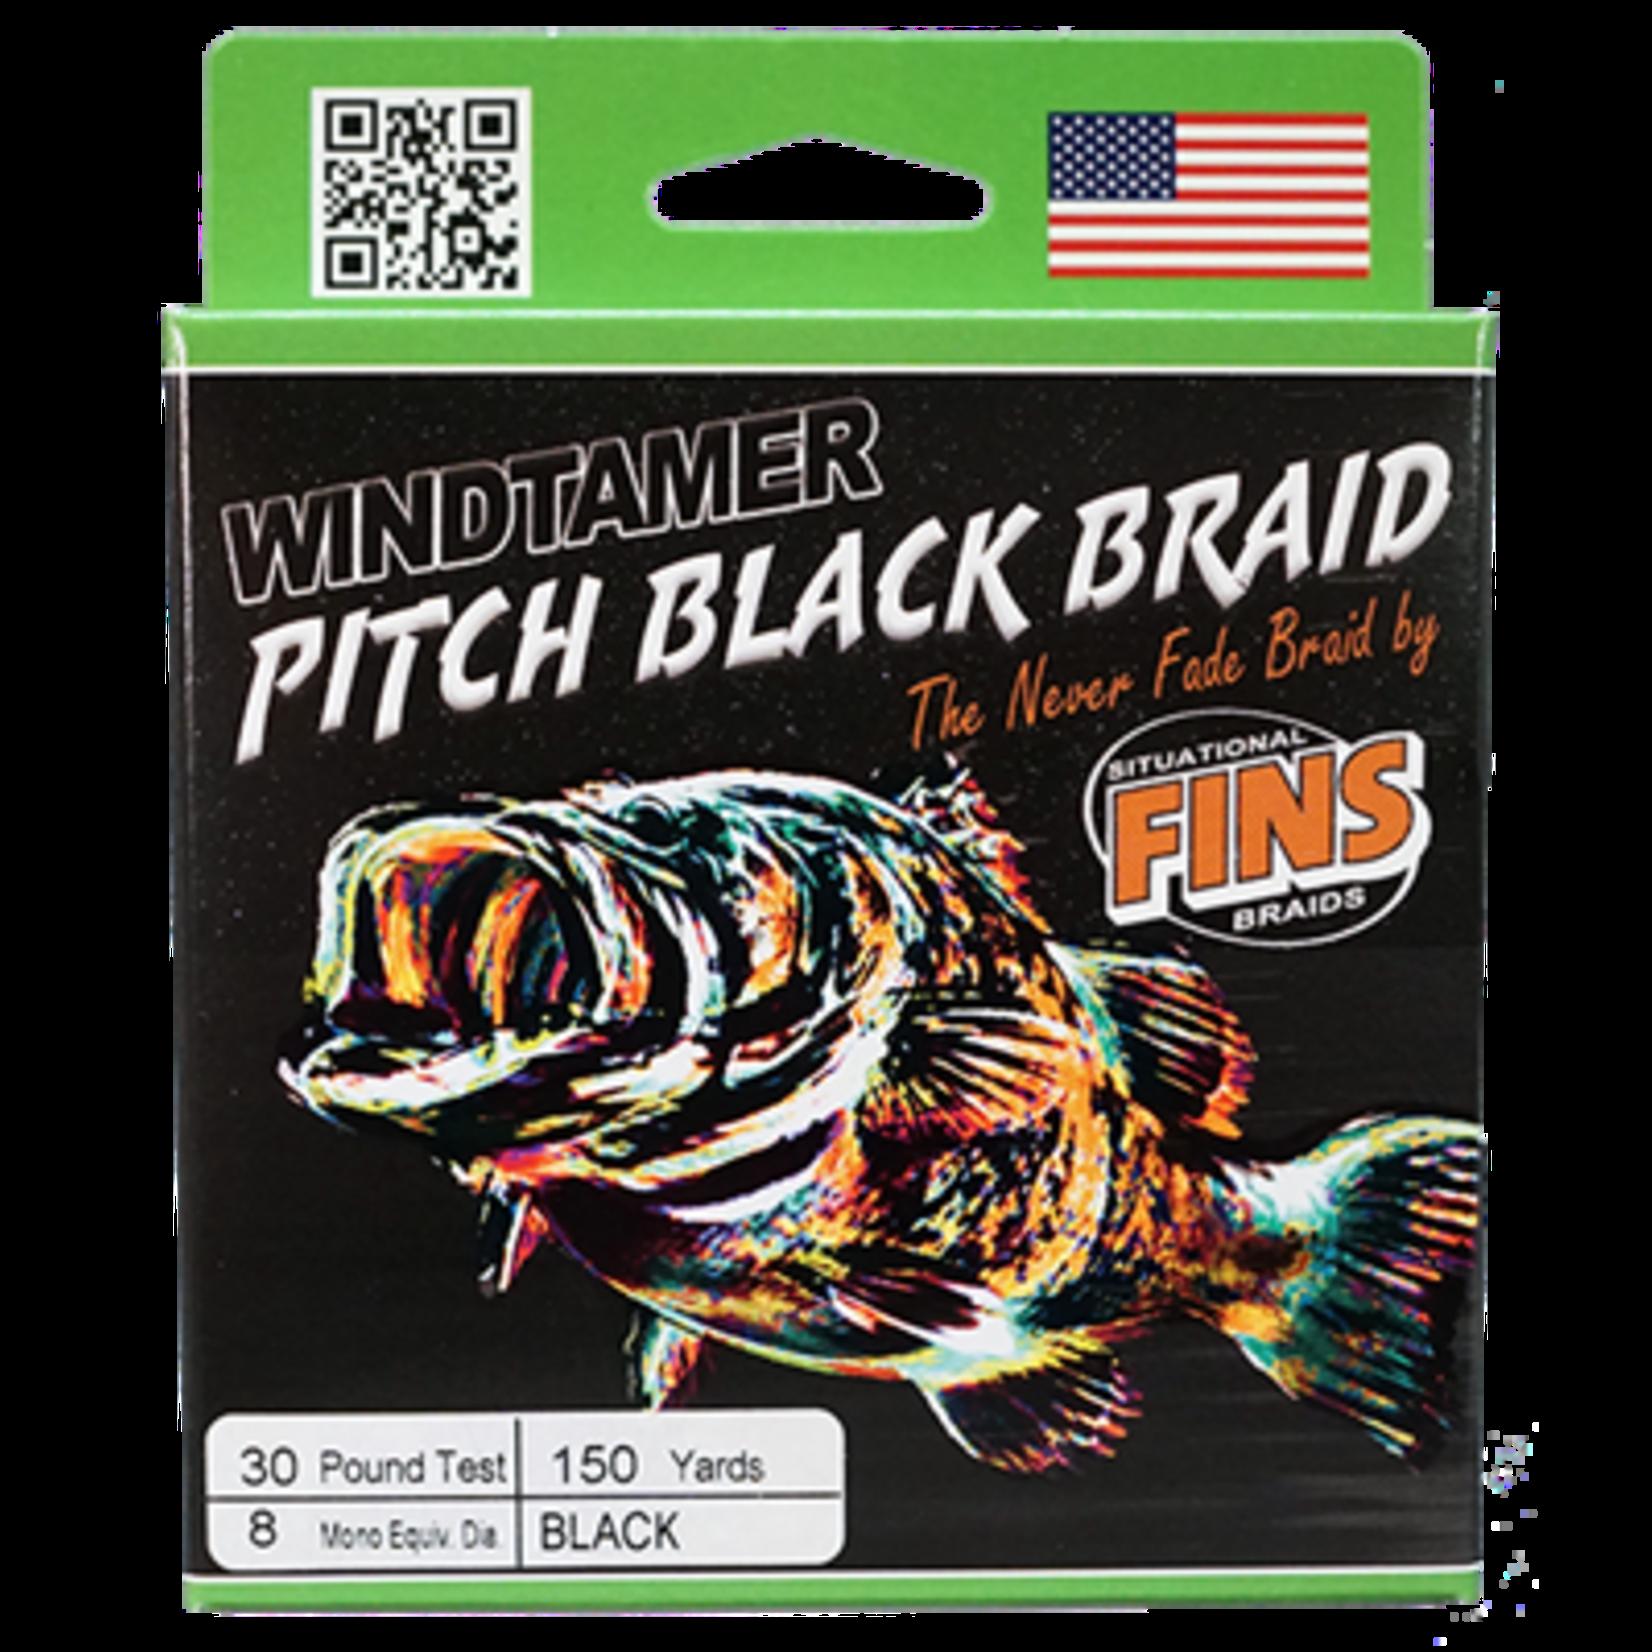 "FINS Braids | 30lb 150 yards ""Pitch Black"""